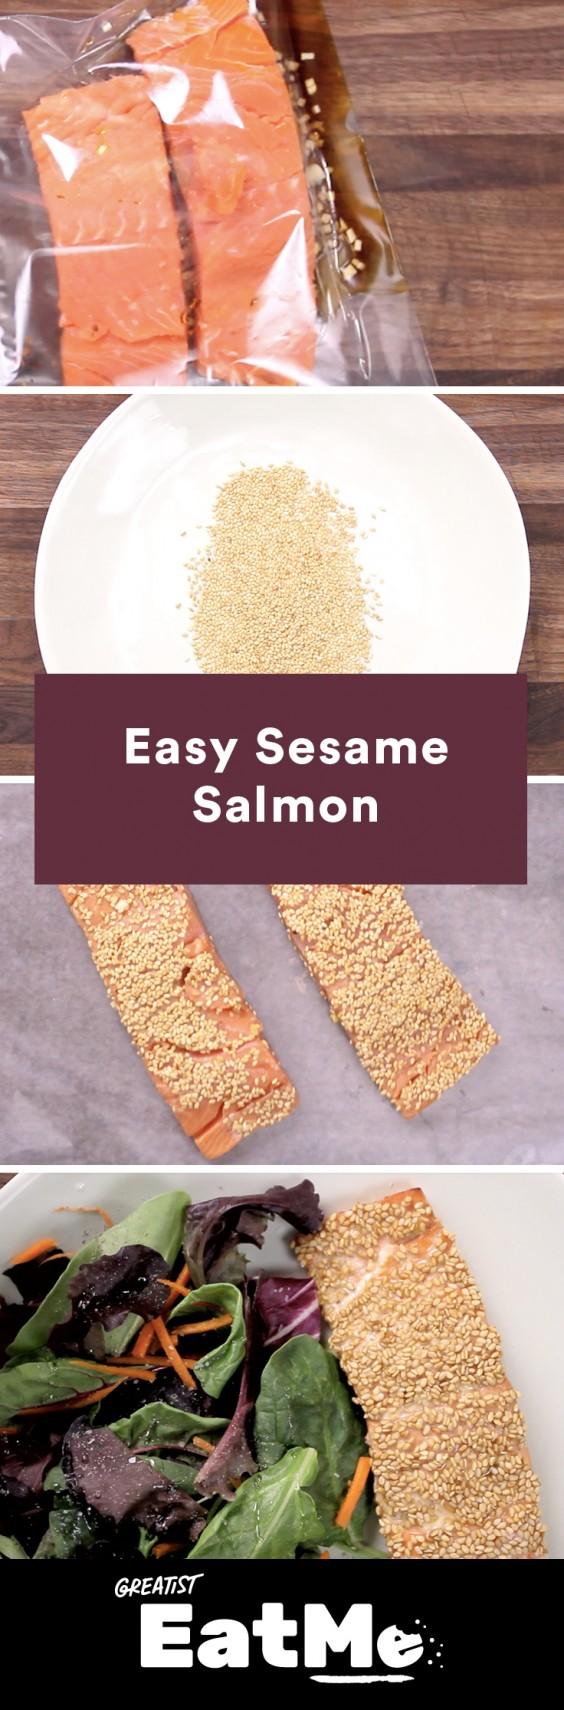 Eat Me Video: Sesame Salmon